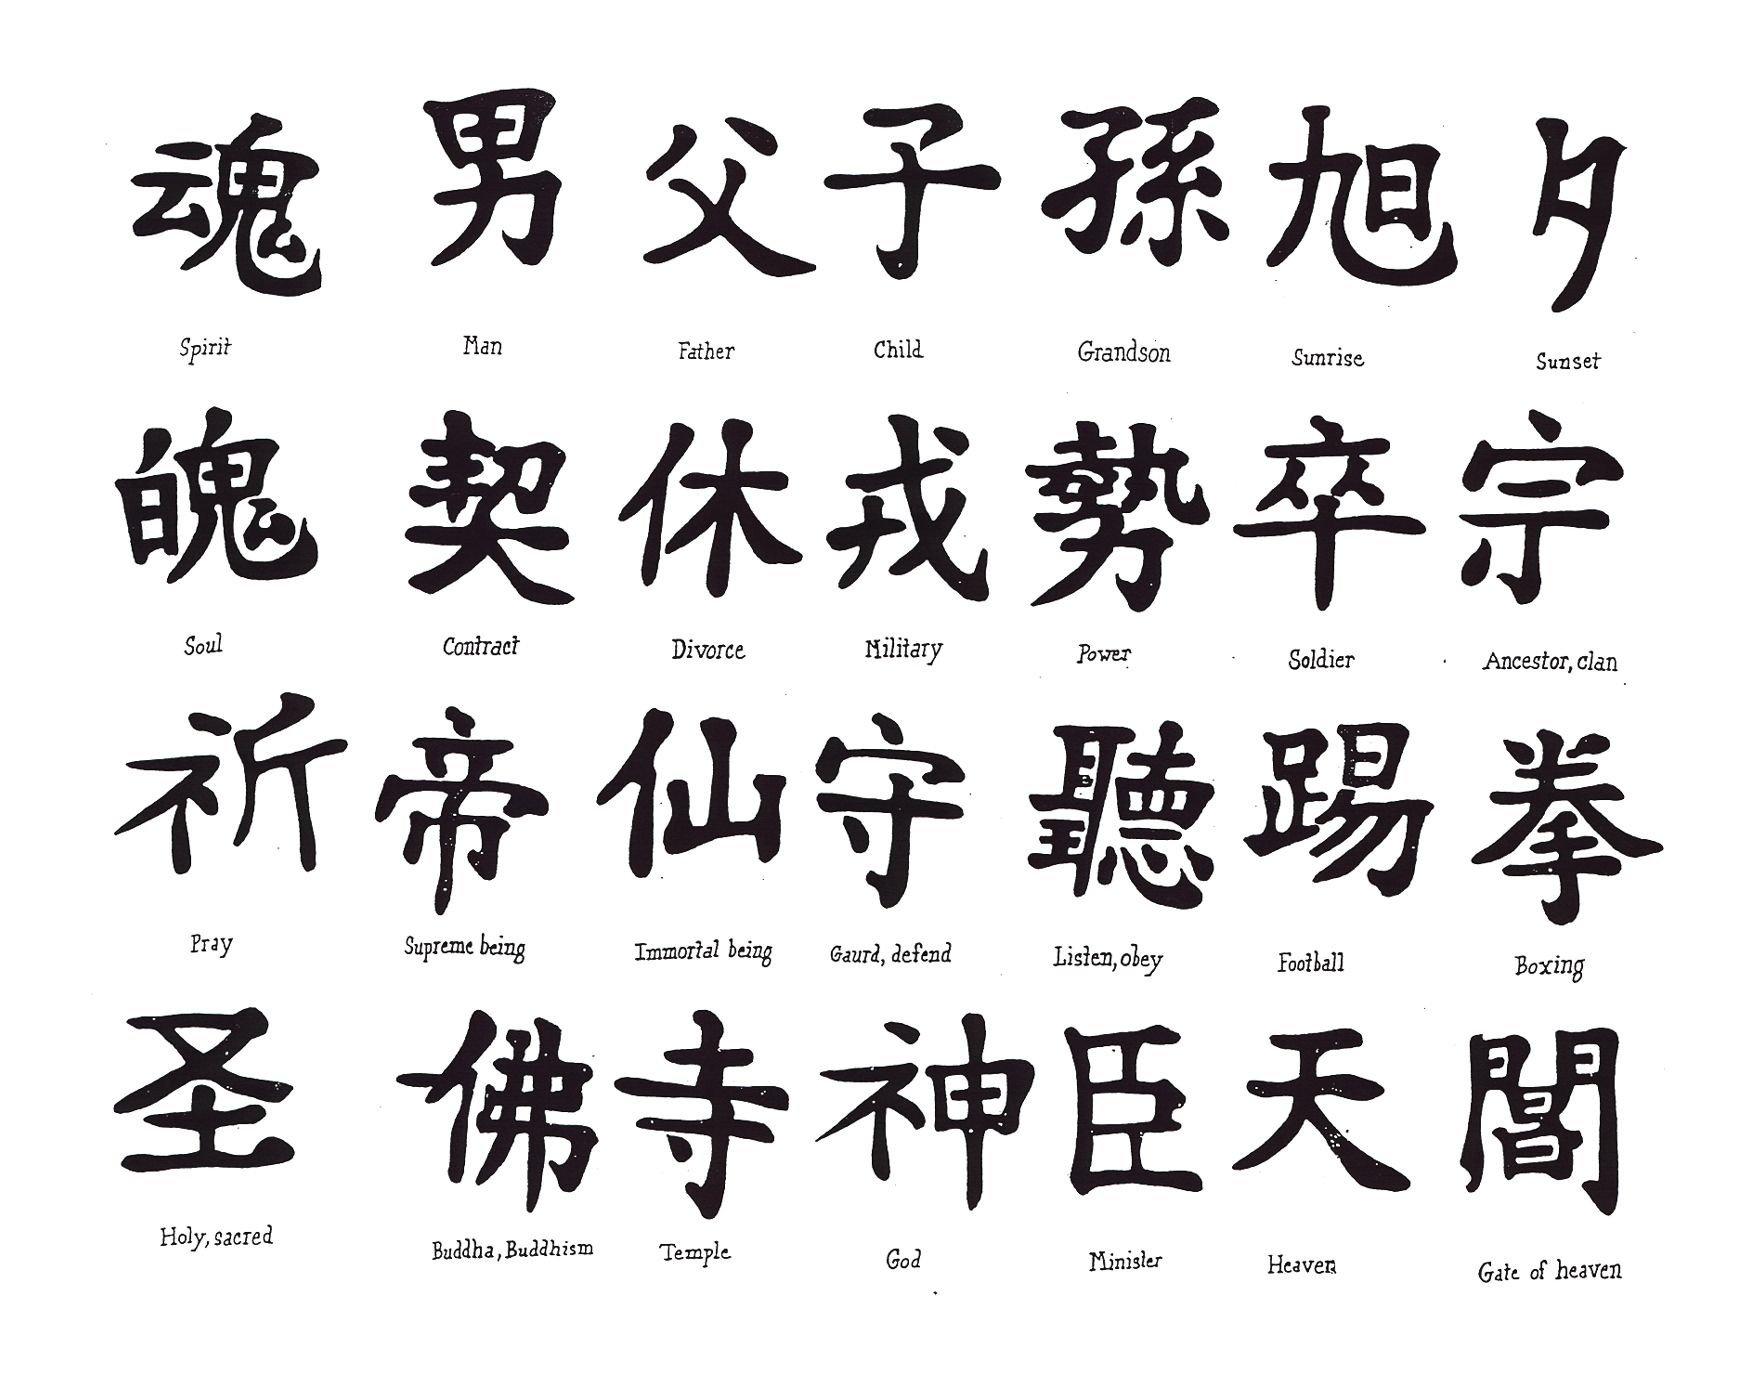 10 Famous Simple Tattoo Ideas For Men 100 beautiful chinese japanese kanji tattoo symbols designs